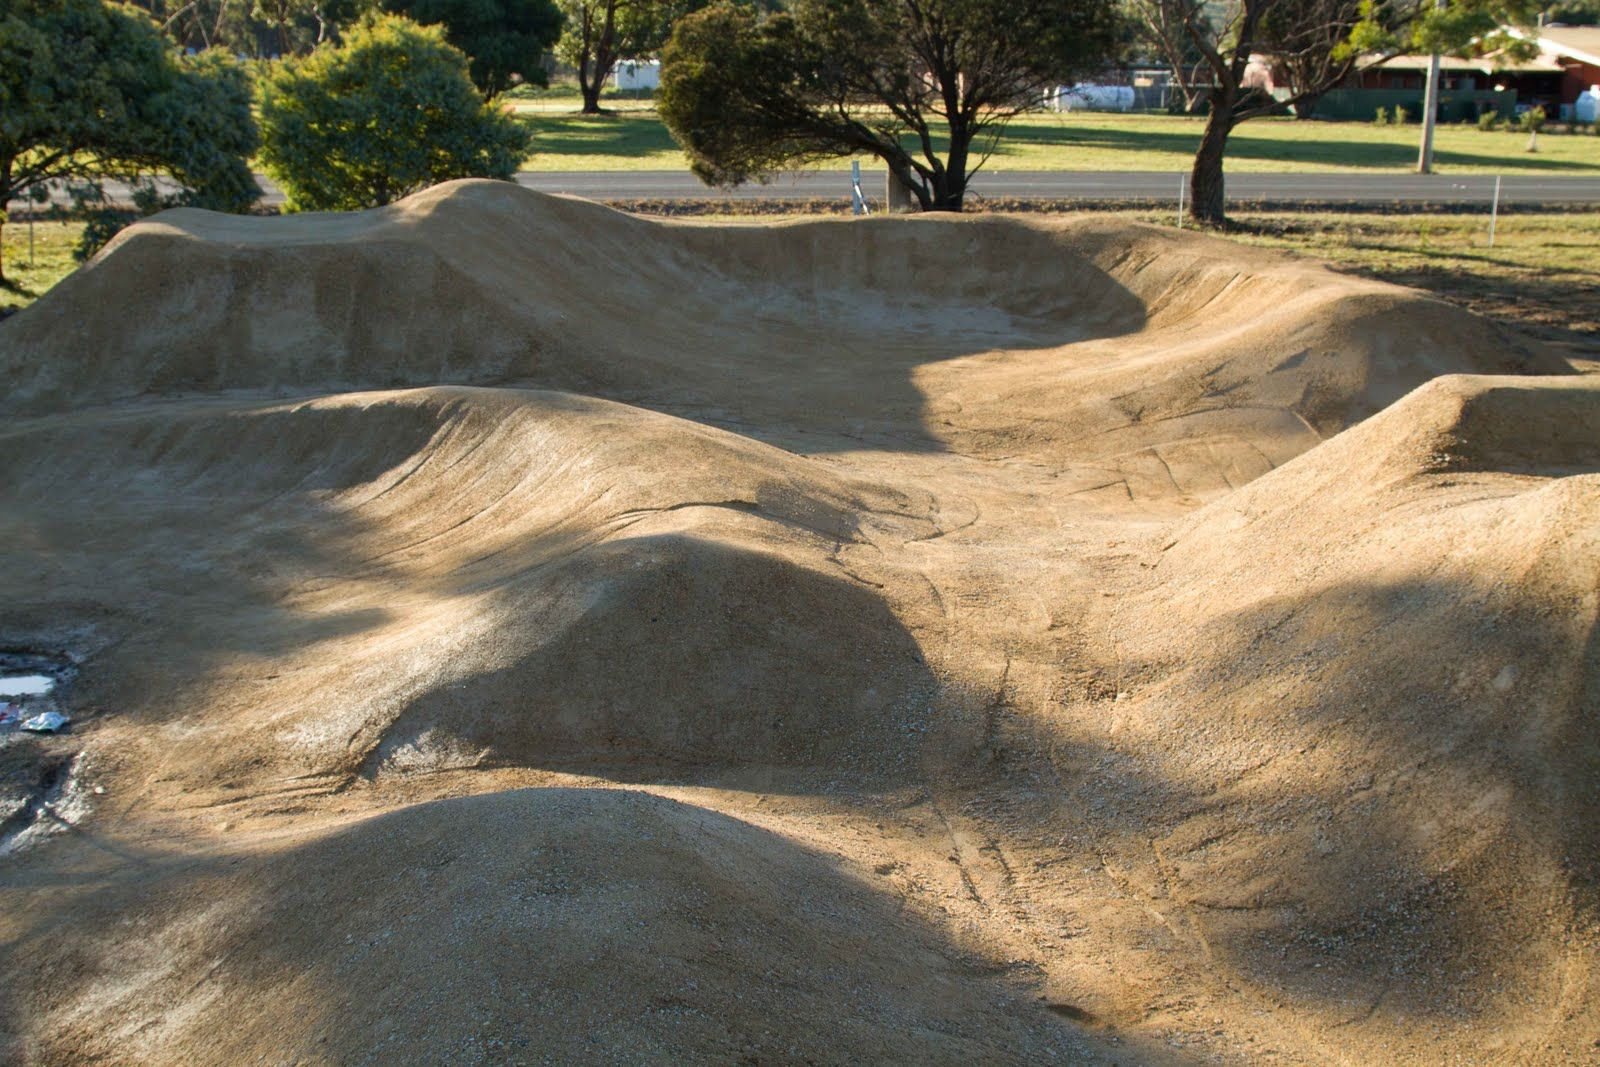 Trail Design Consultancy Construction Motocross Tracks Dirt Bike Track Bike Pump Track Mini backyard motocross track